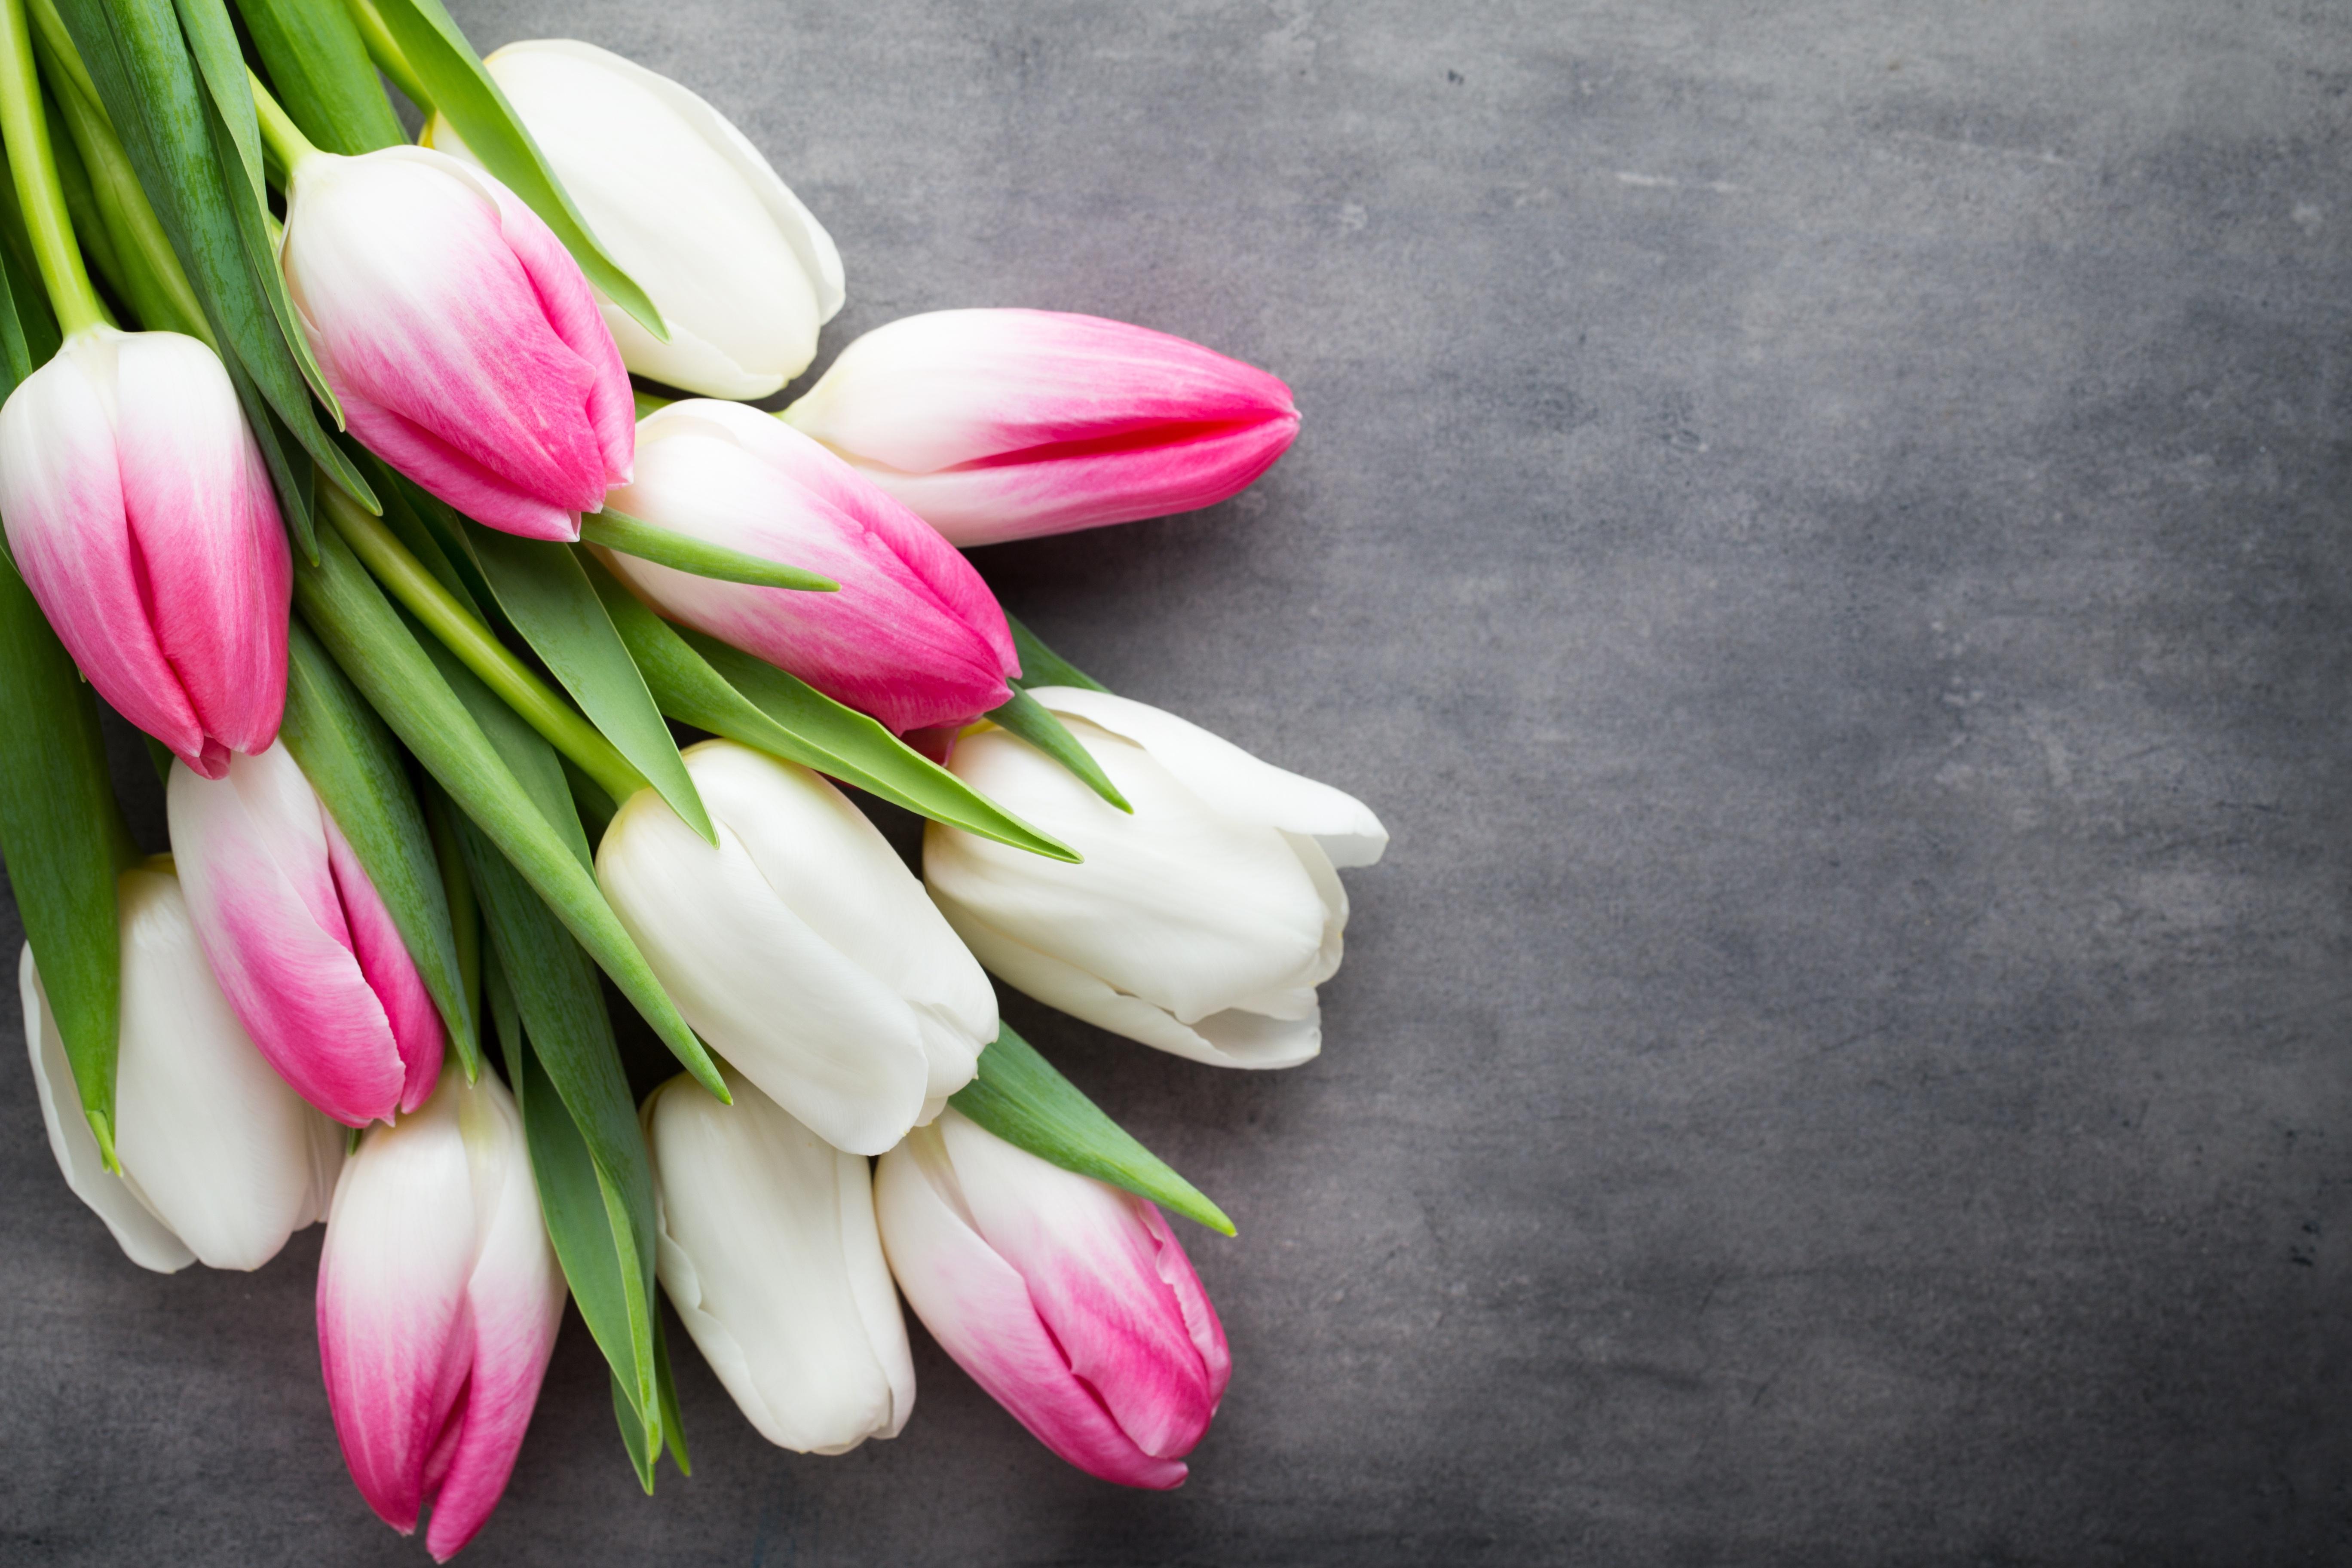 тюльпаны букет мешковина без смс